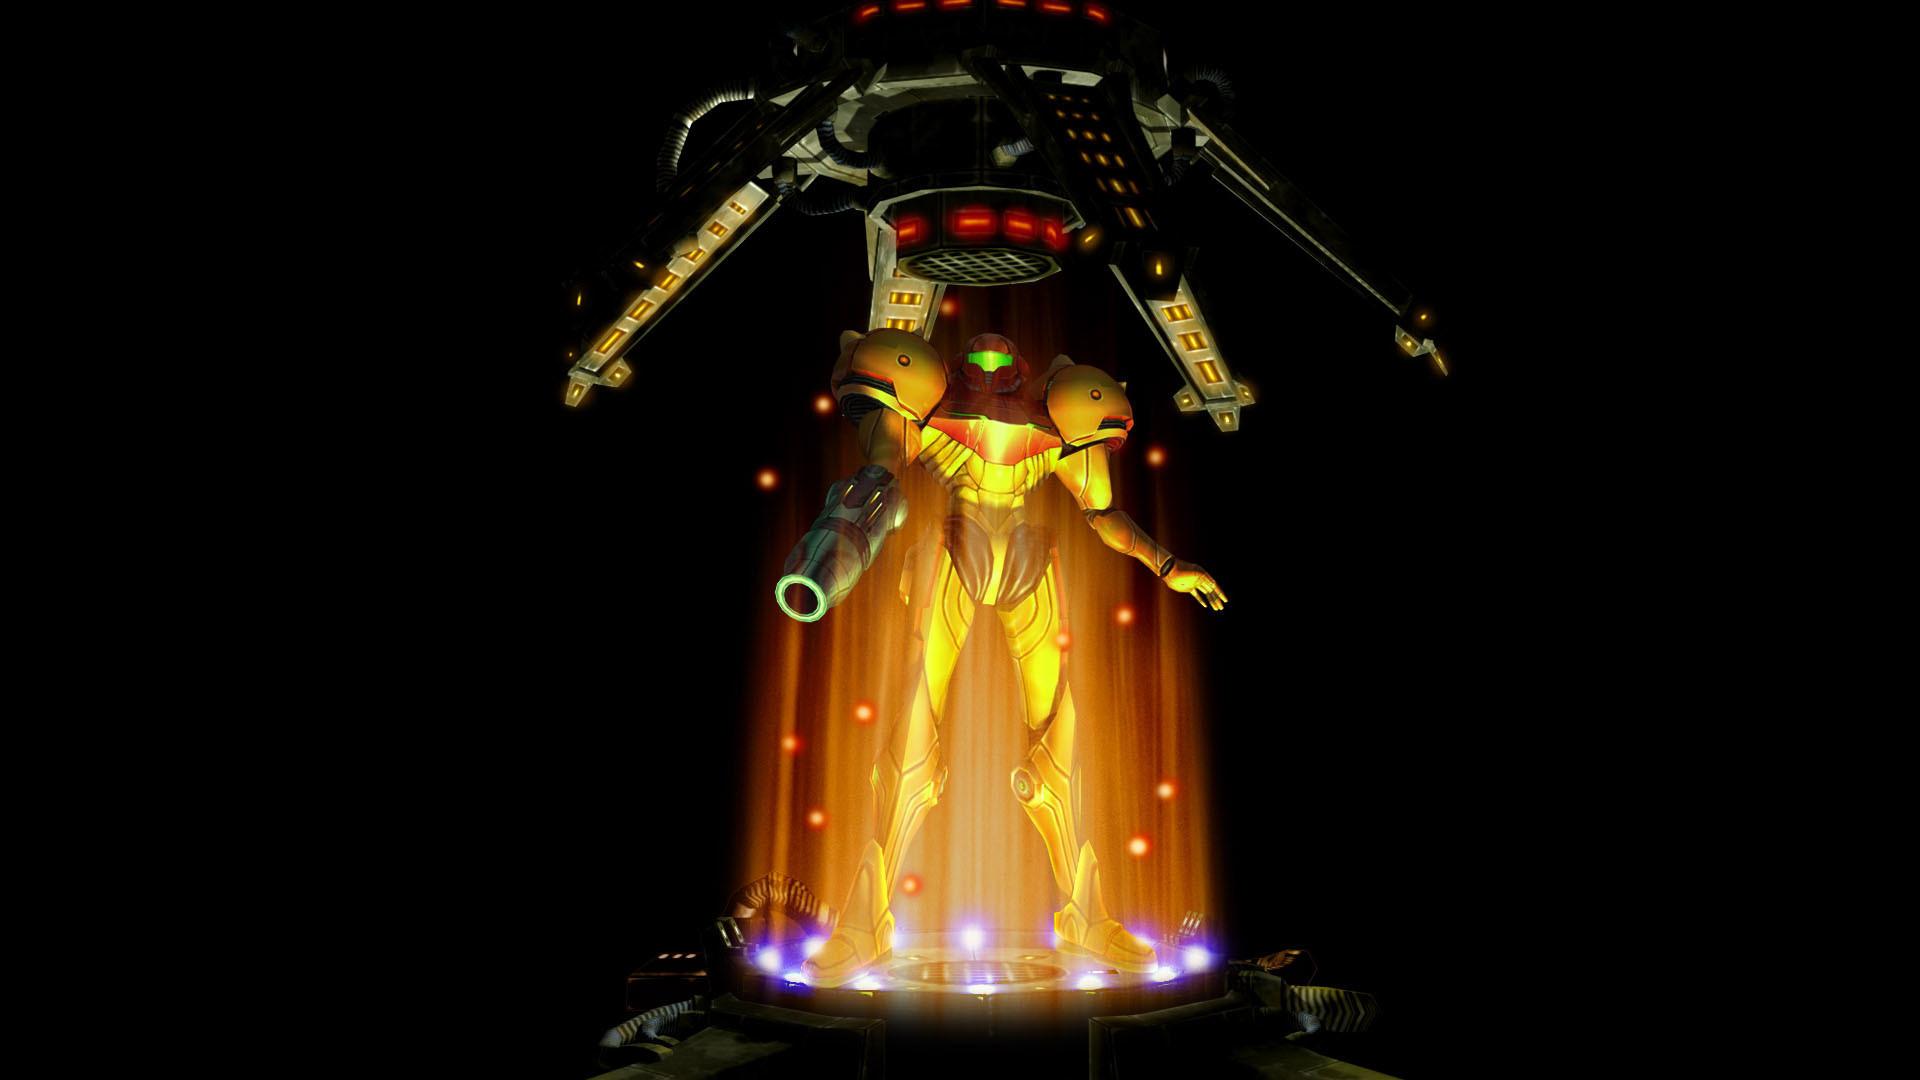 … Metroid Prime Trilogy – Fanart – Background …